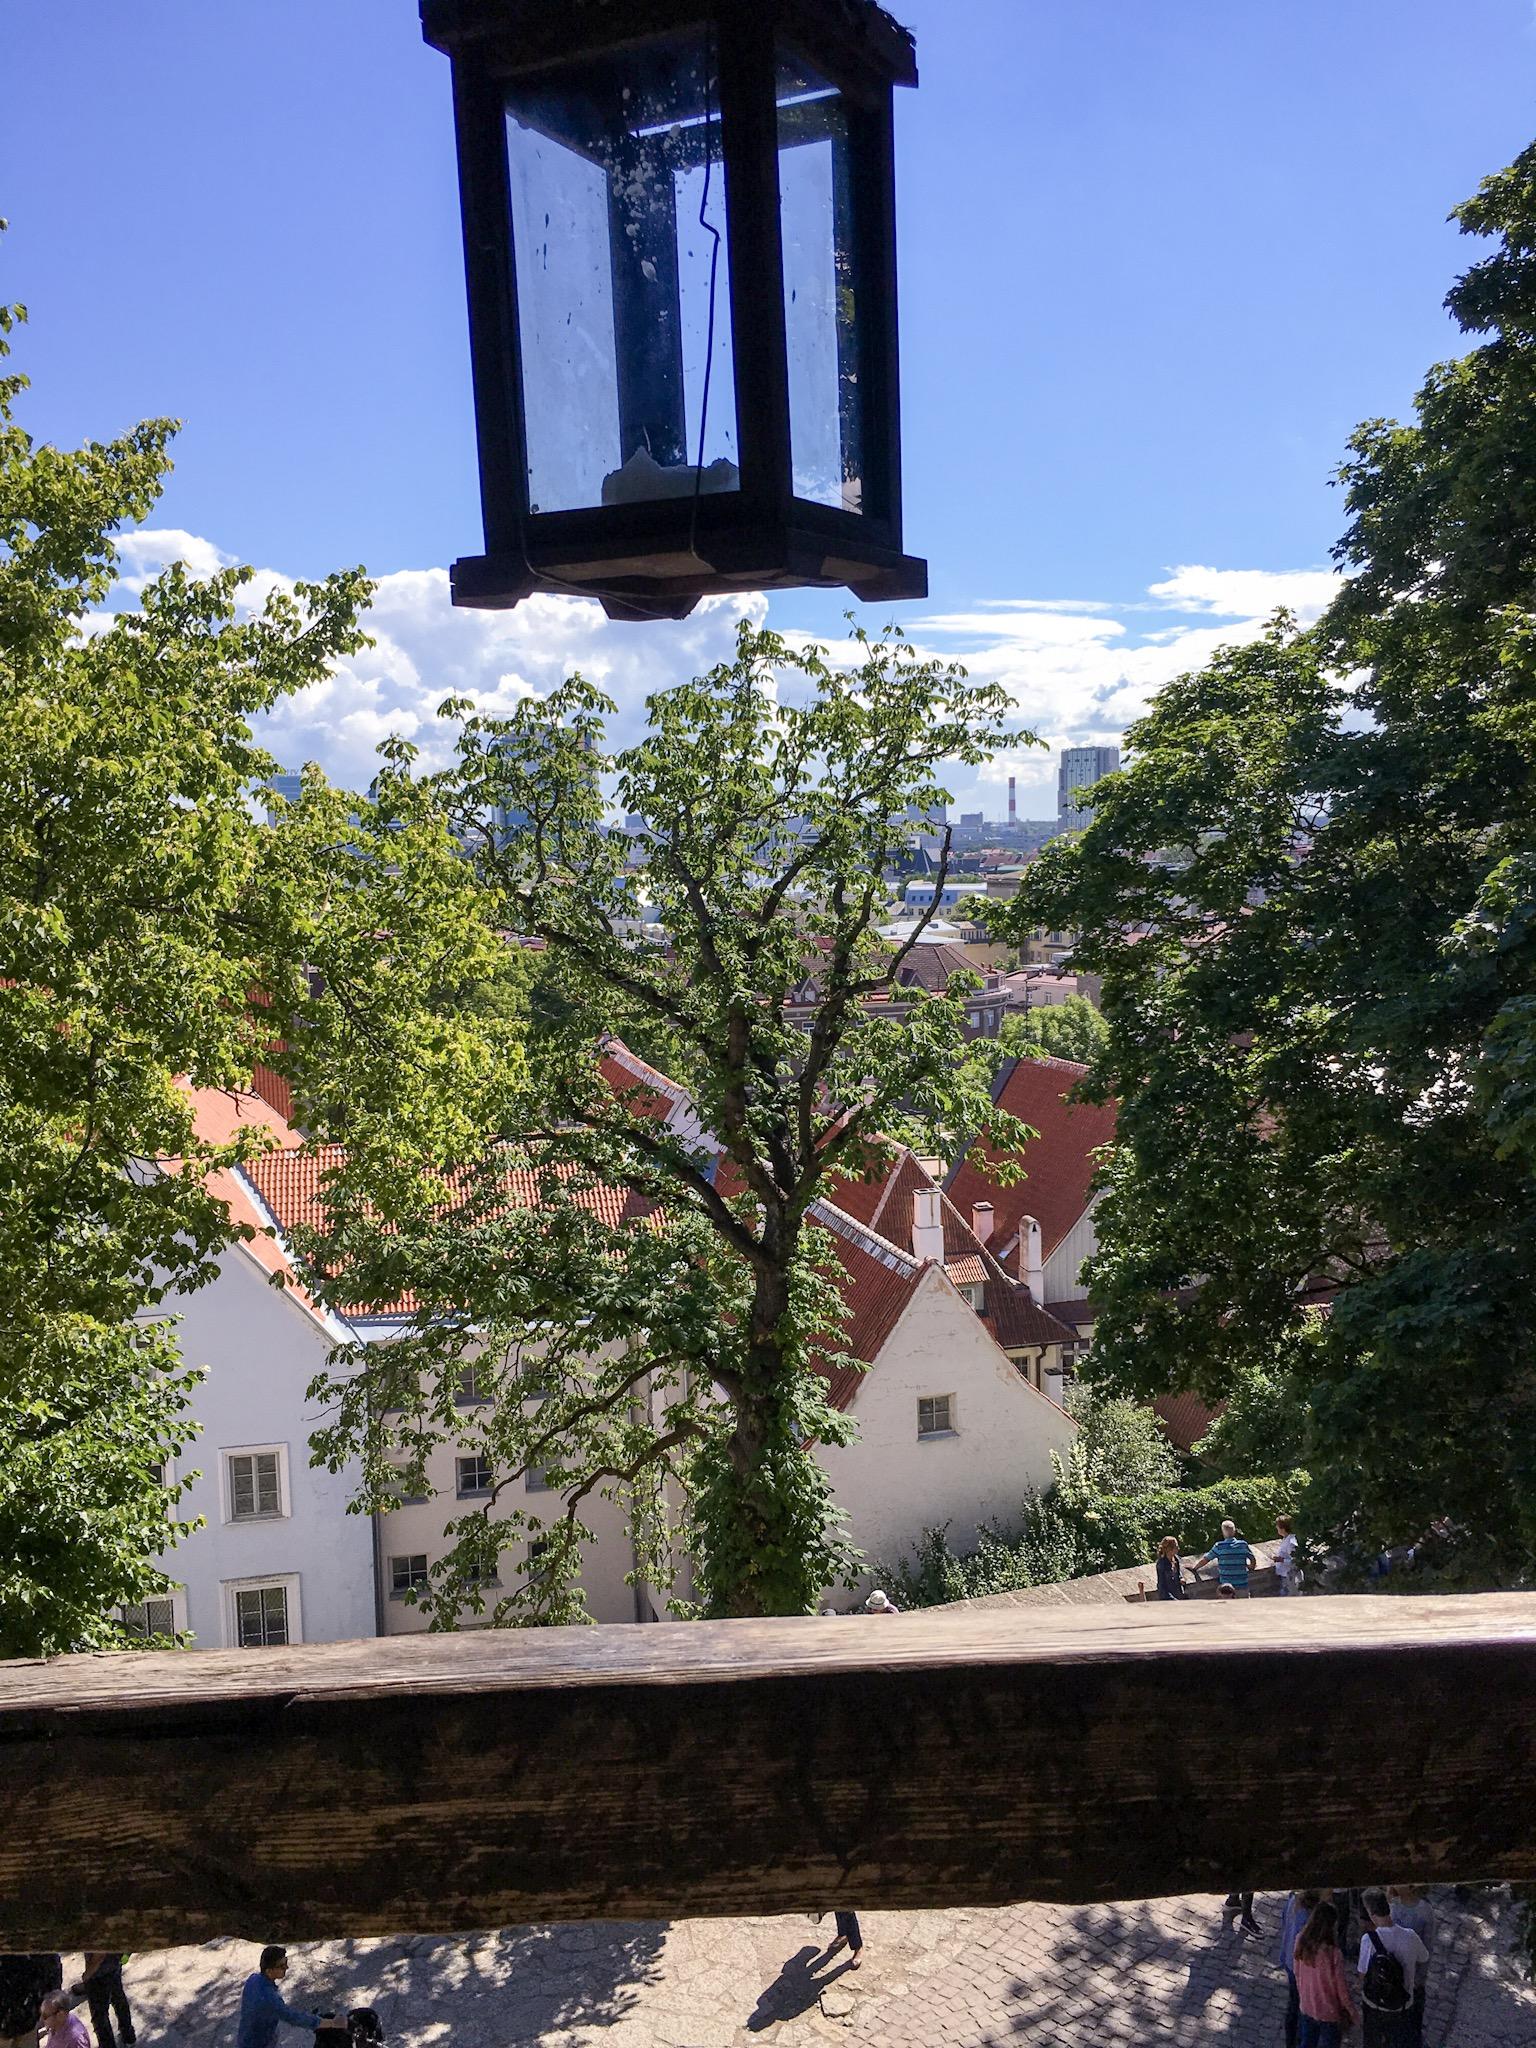 View from Cafe in Tallinn, Estonia